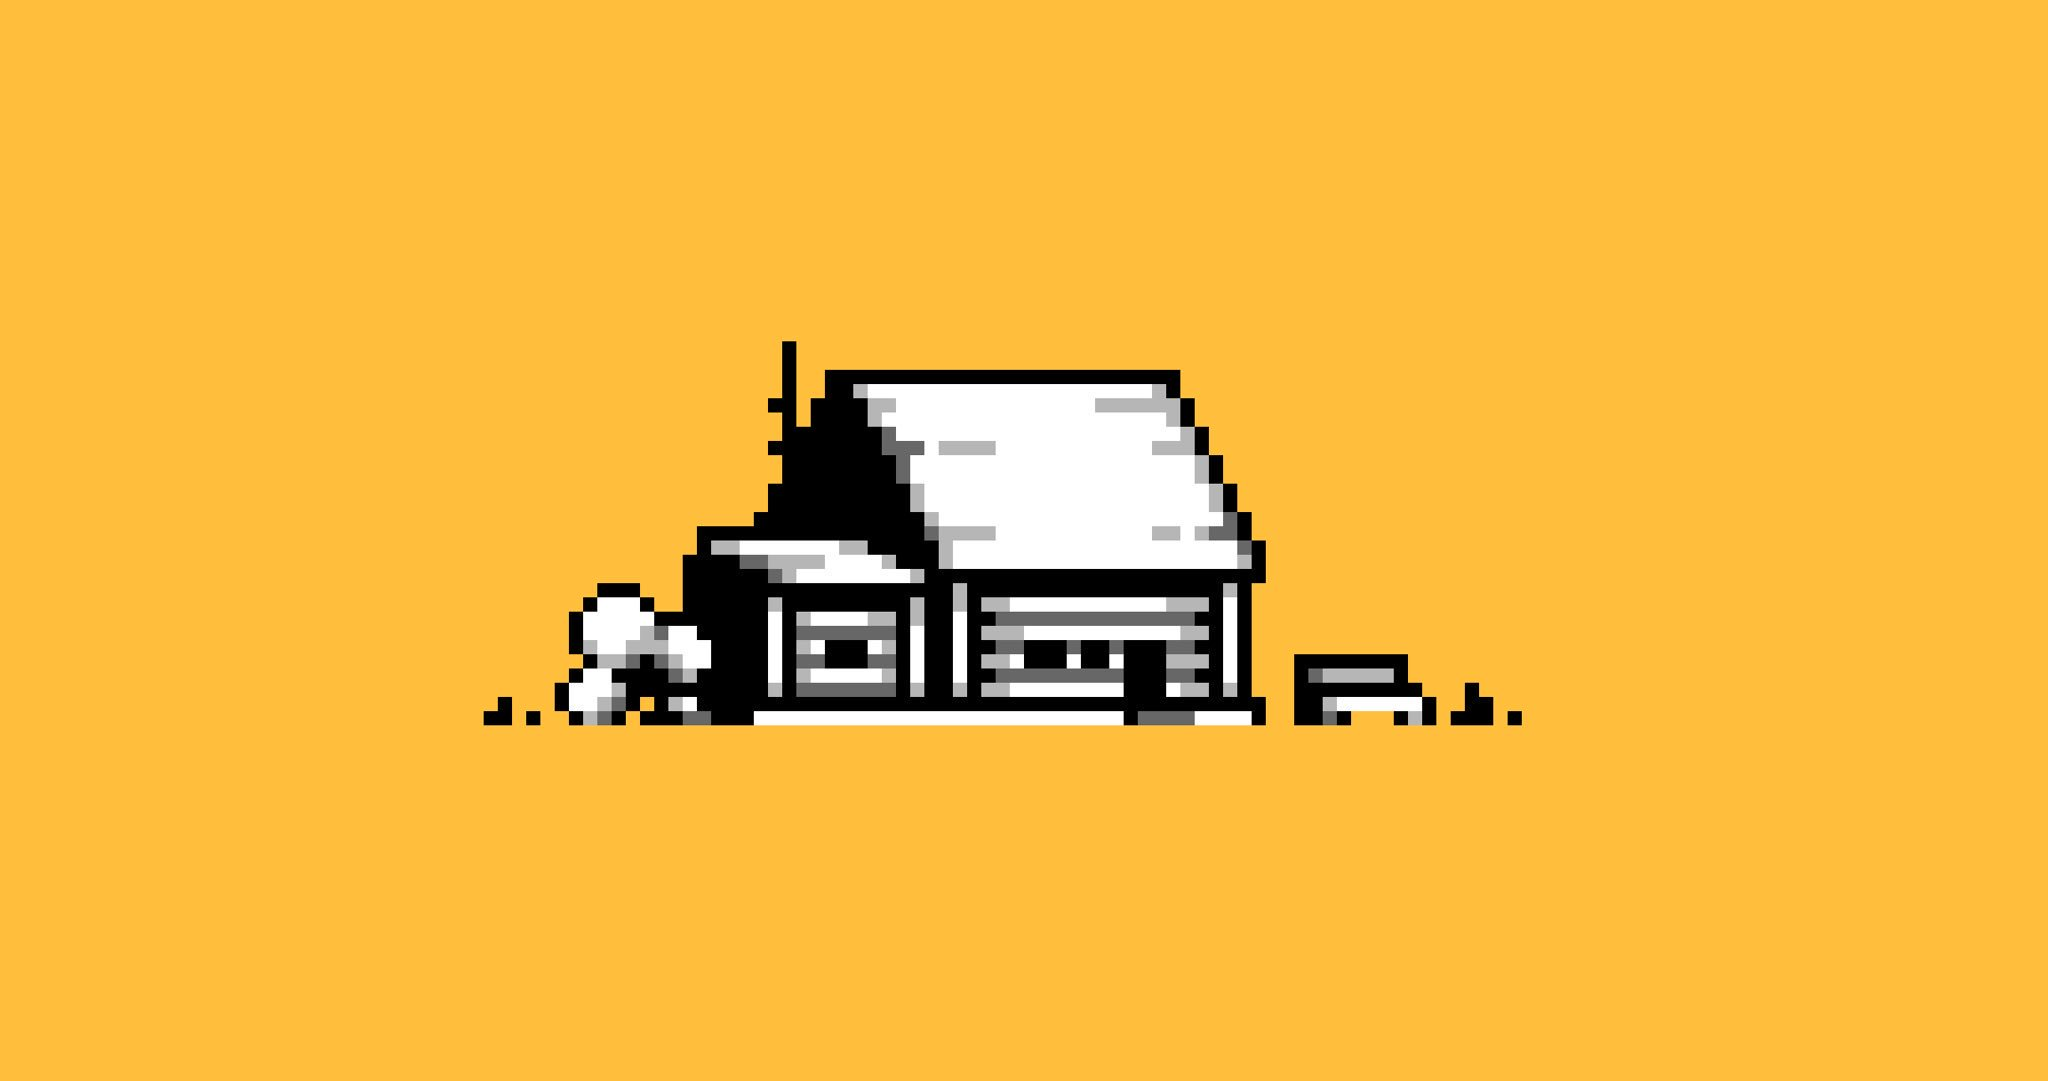 Pixel Art - Monochrome House